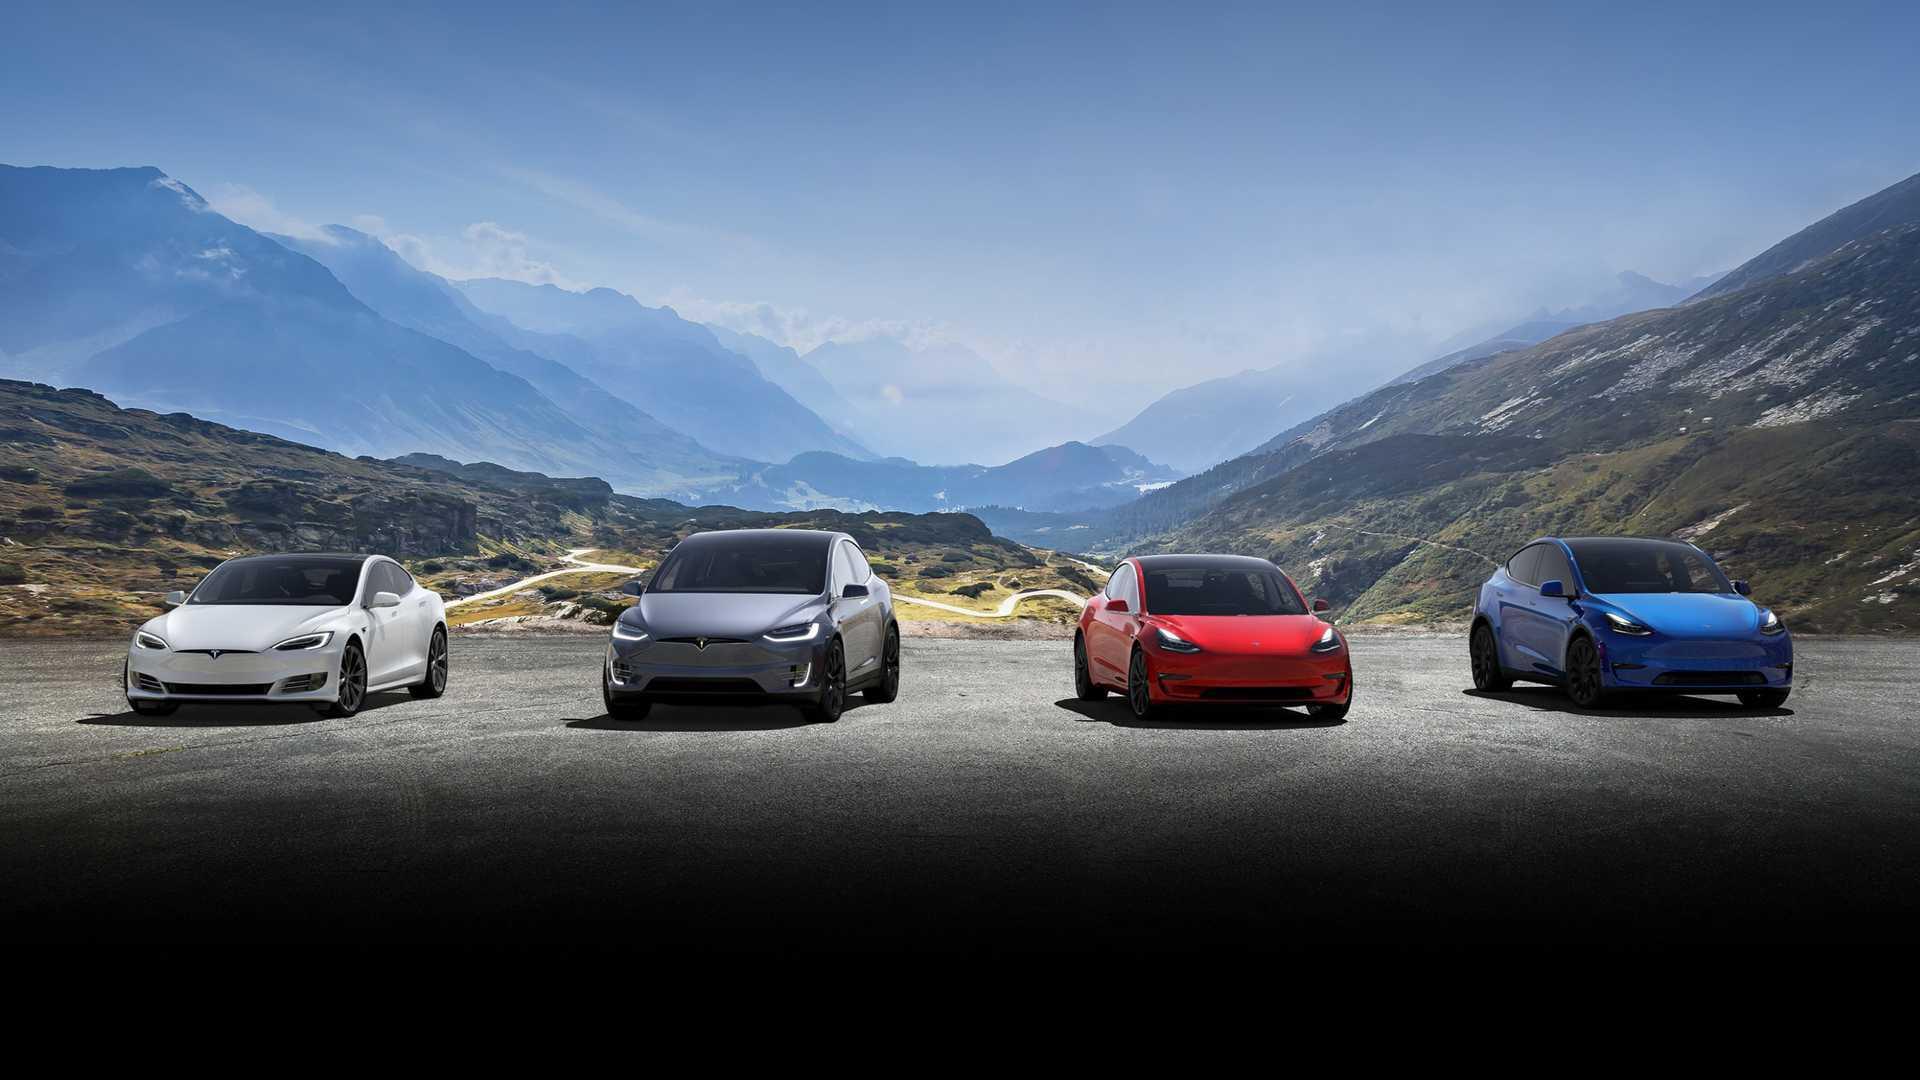 U.S.: Tesla H1 2020 Sales Estimated At Up To 90,000